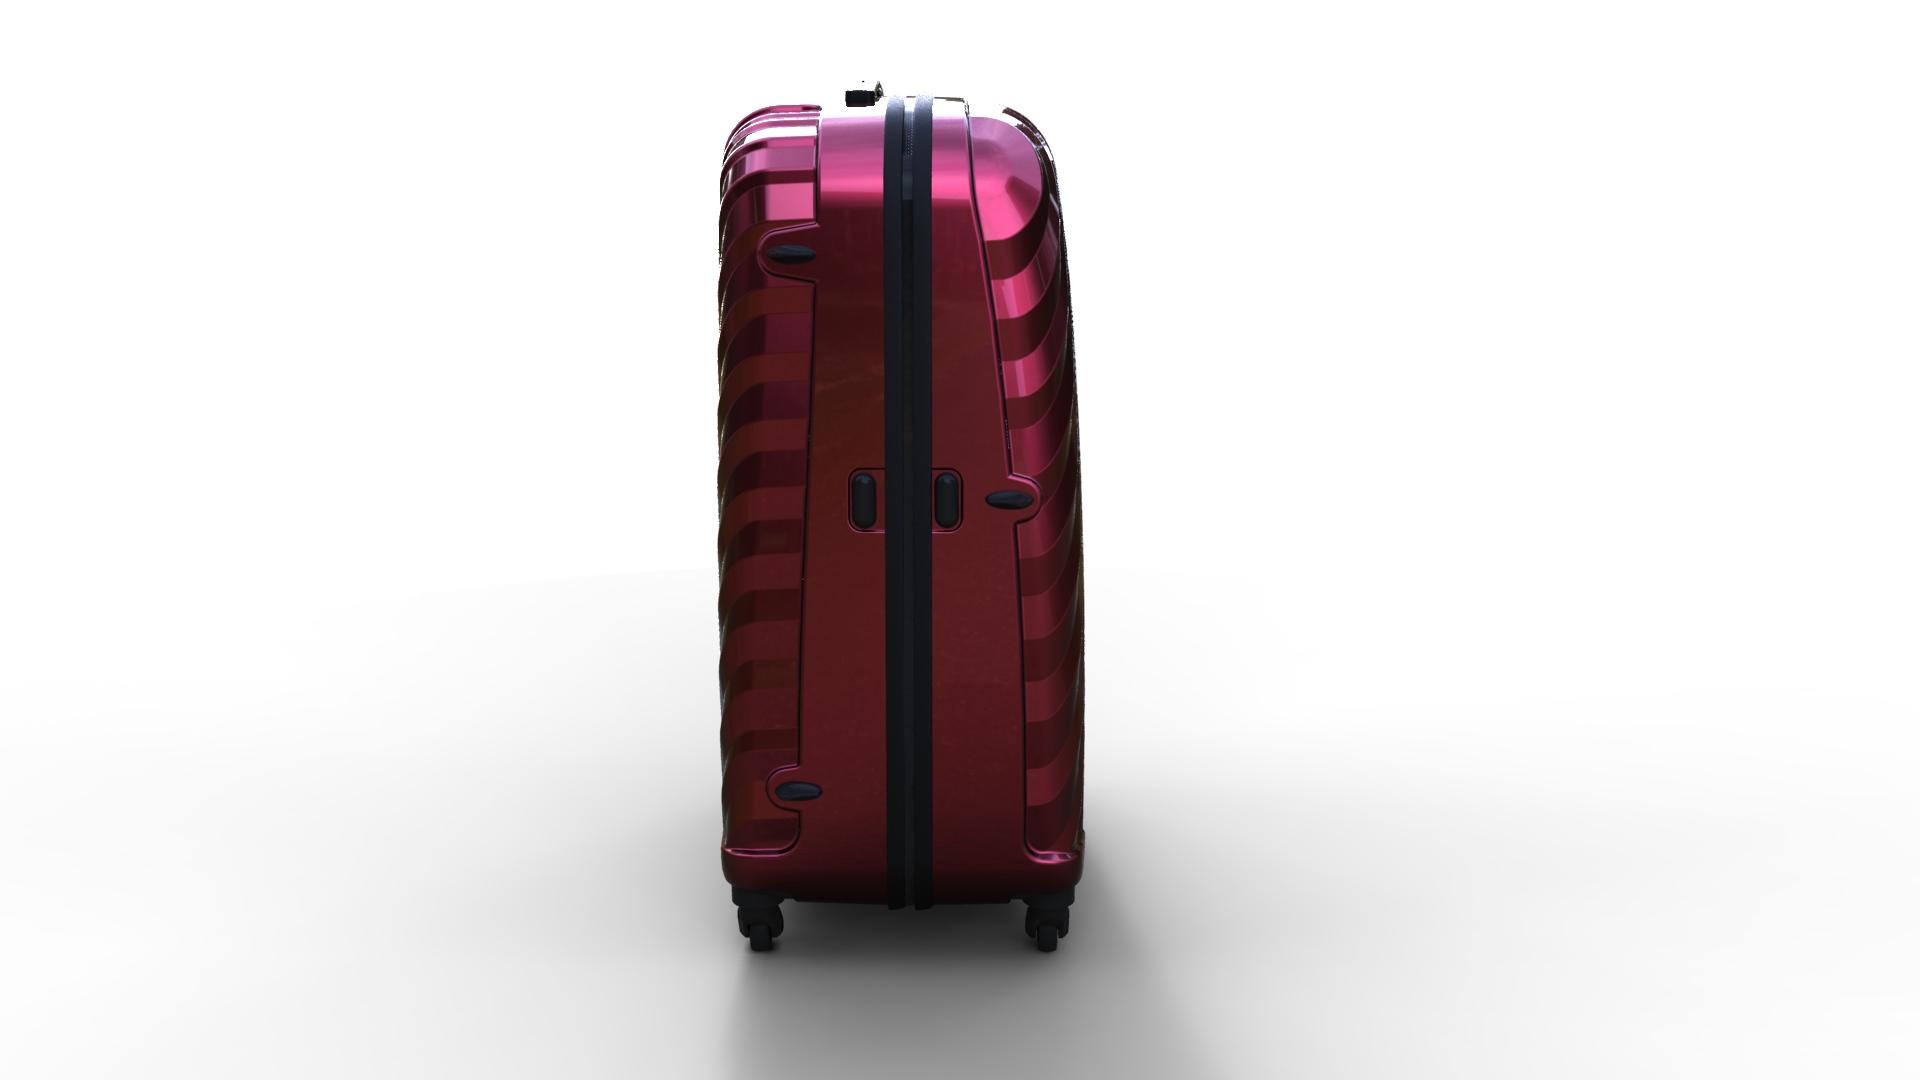 trolley suitcase bag 03 3d model max fbx ma mb obj 285999